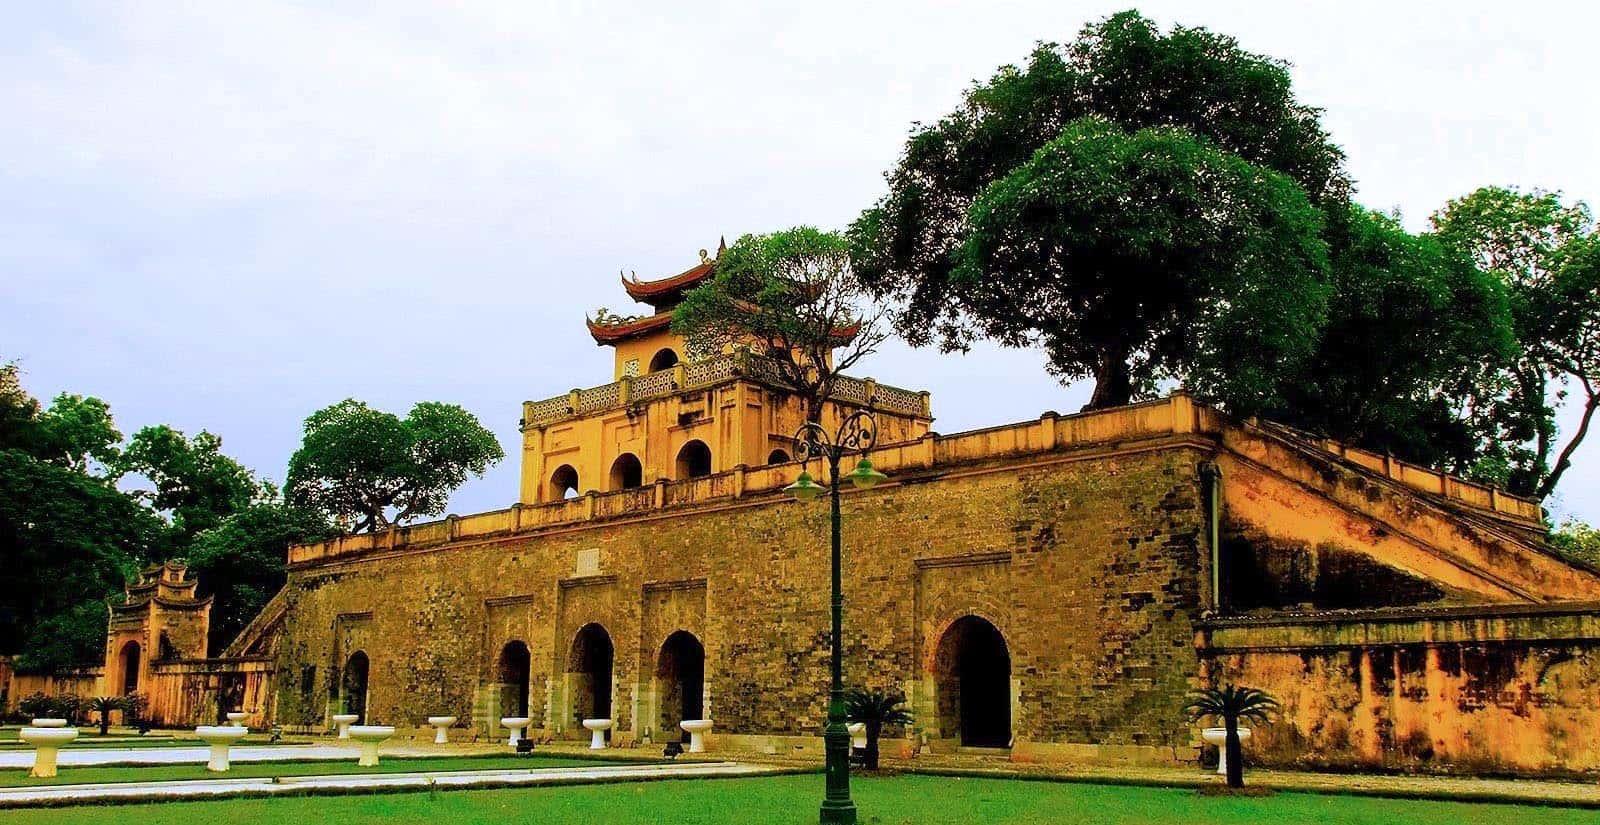 2. Imperial Citadel of Thang Long